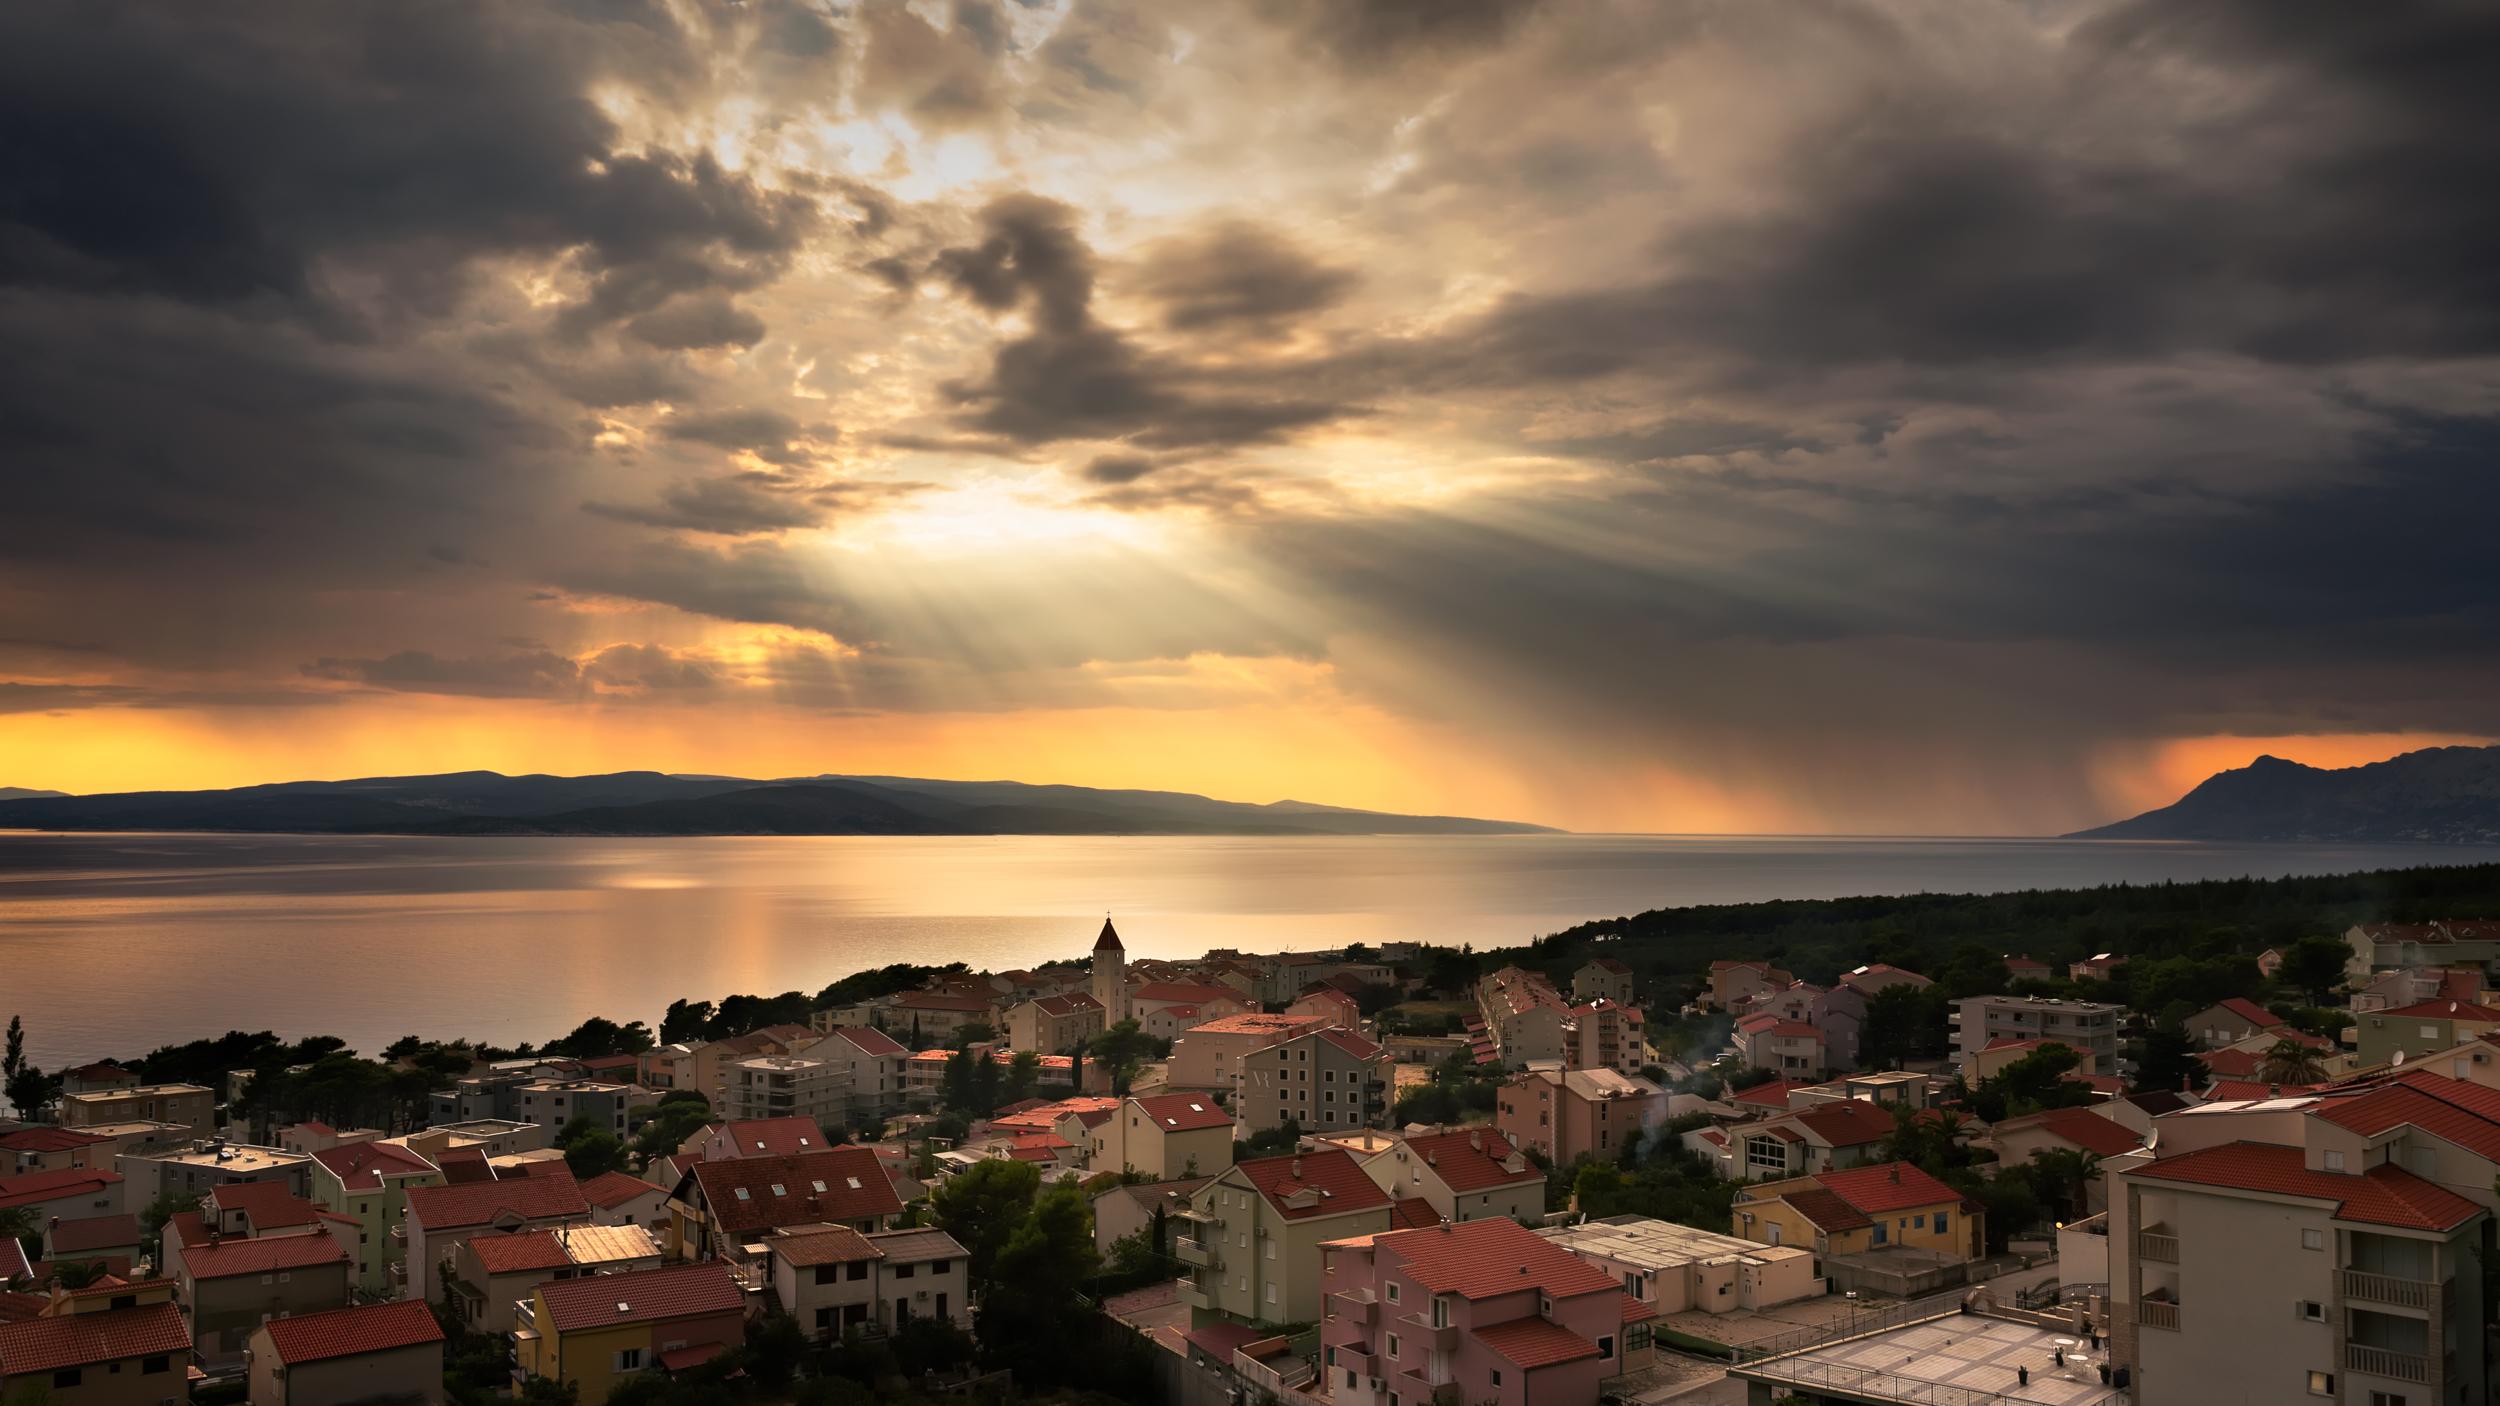 Beautiful sunset with rain clouds in Promanja - Croatia